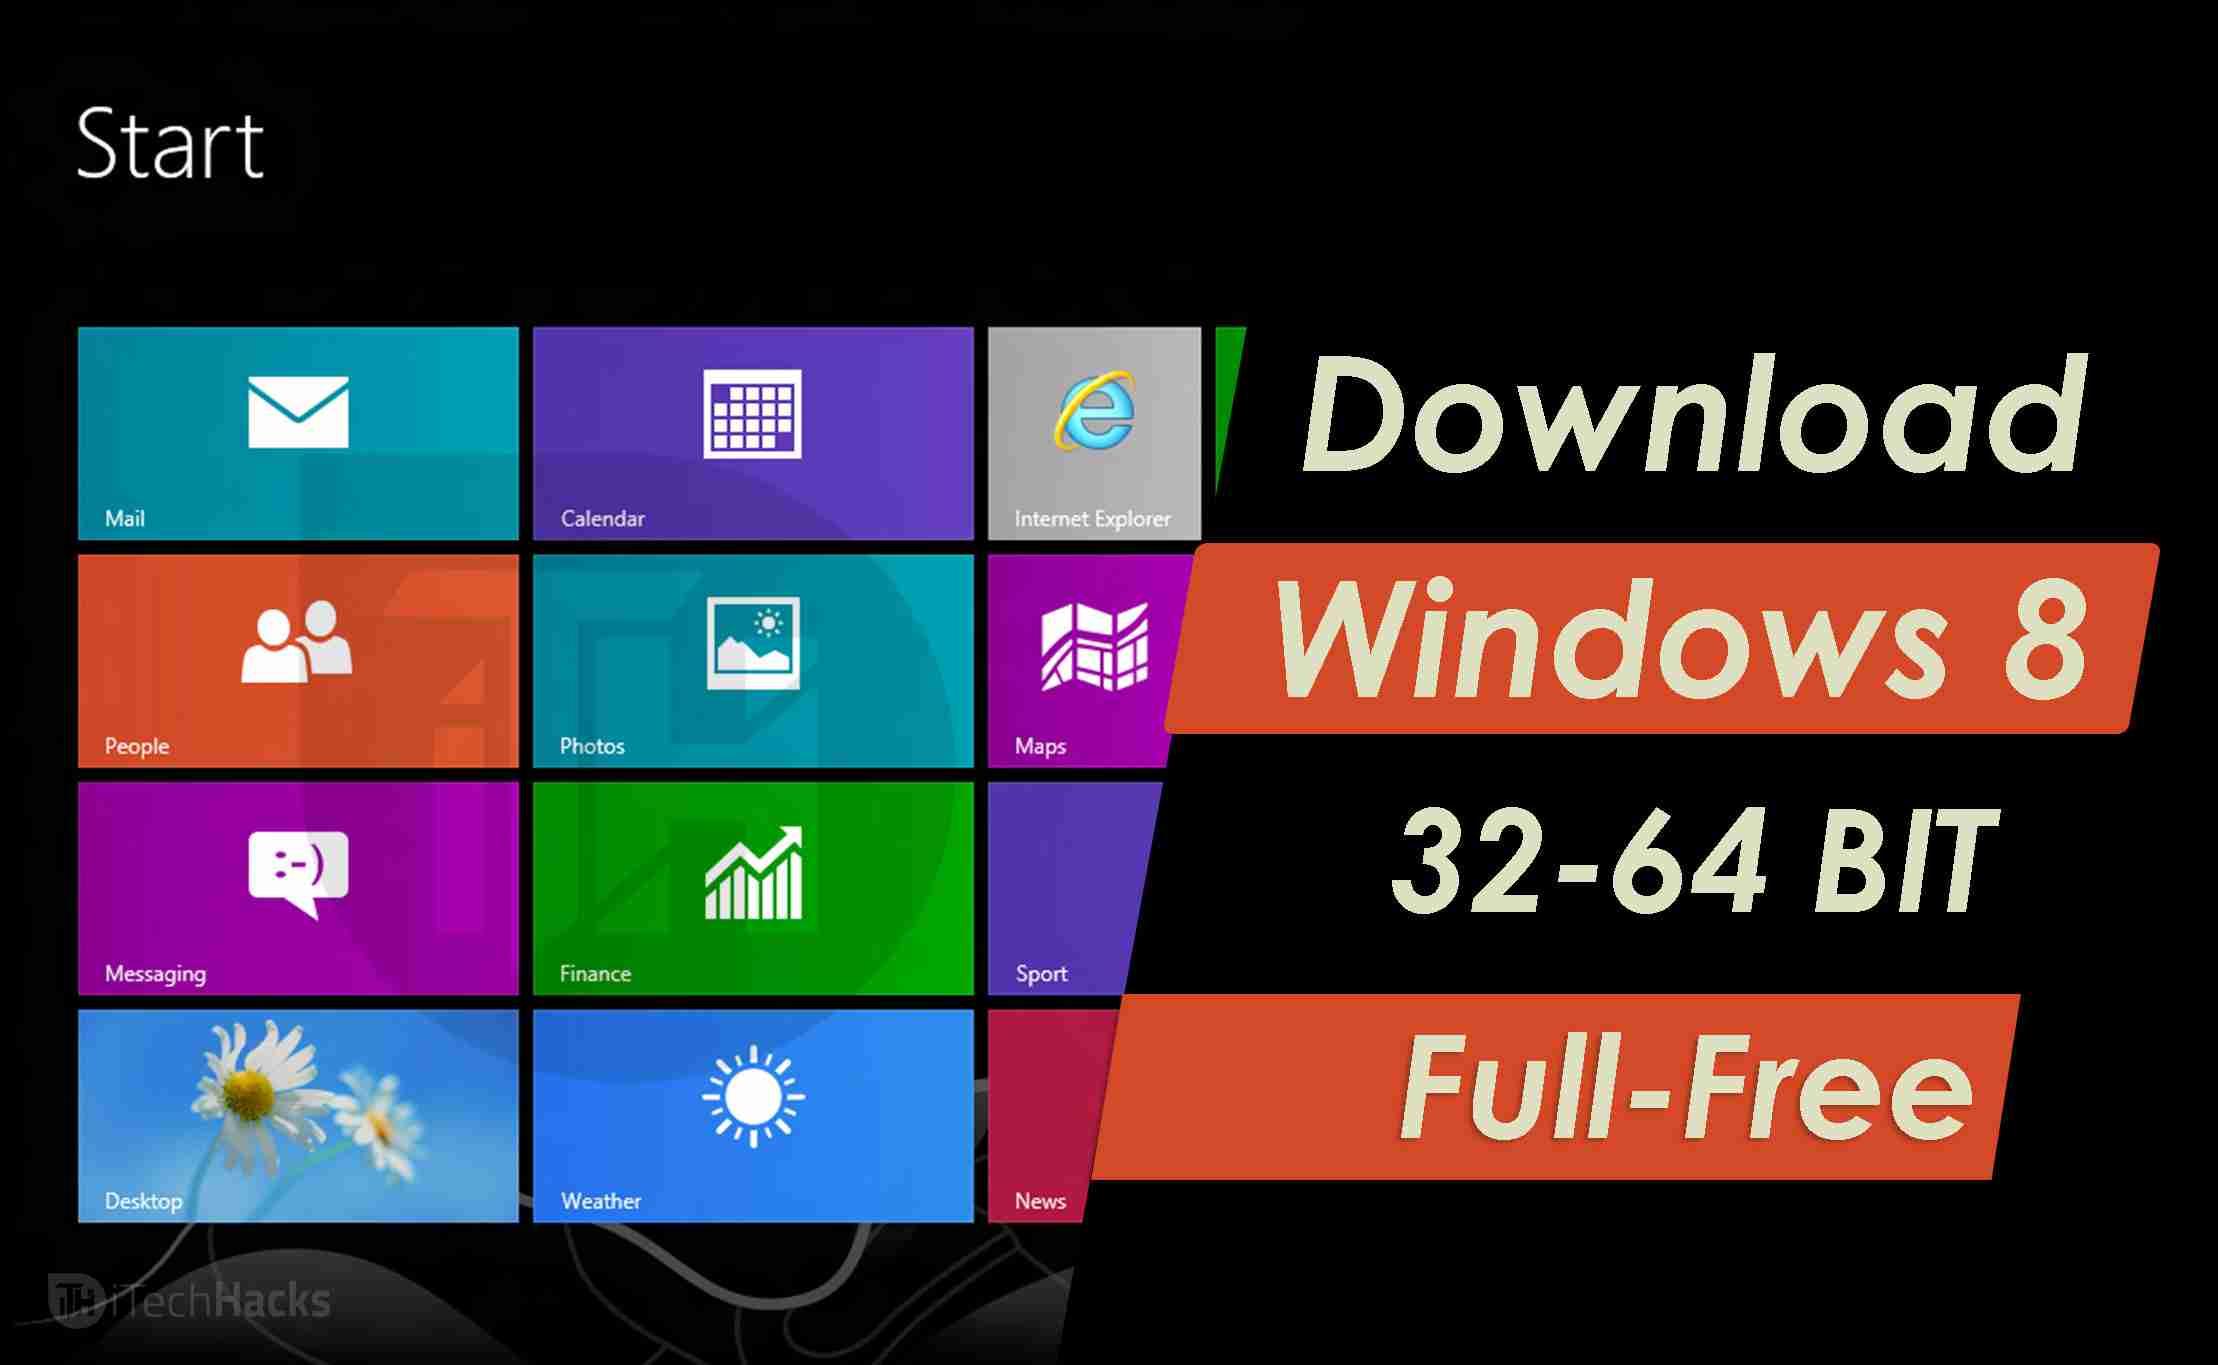 Download Windows 8 (32 Bit-64 Bit) Full Free